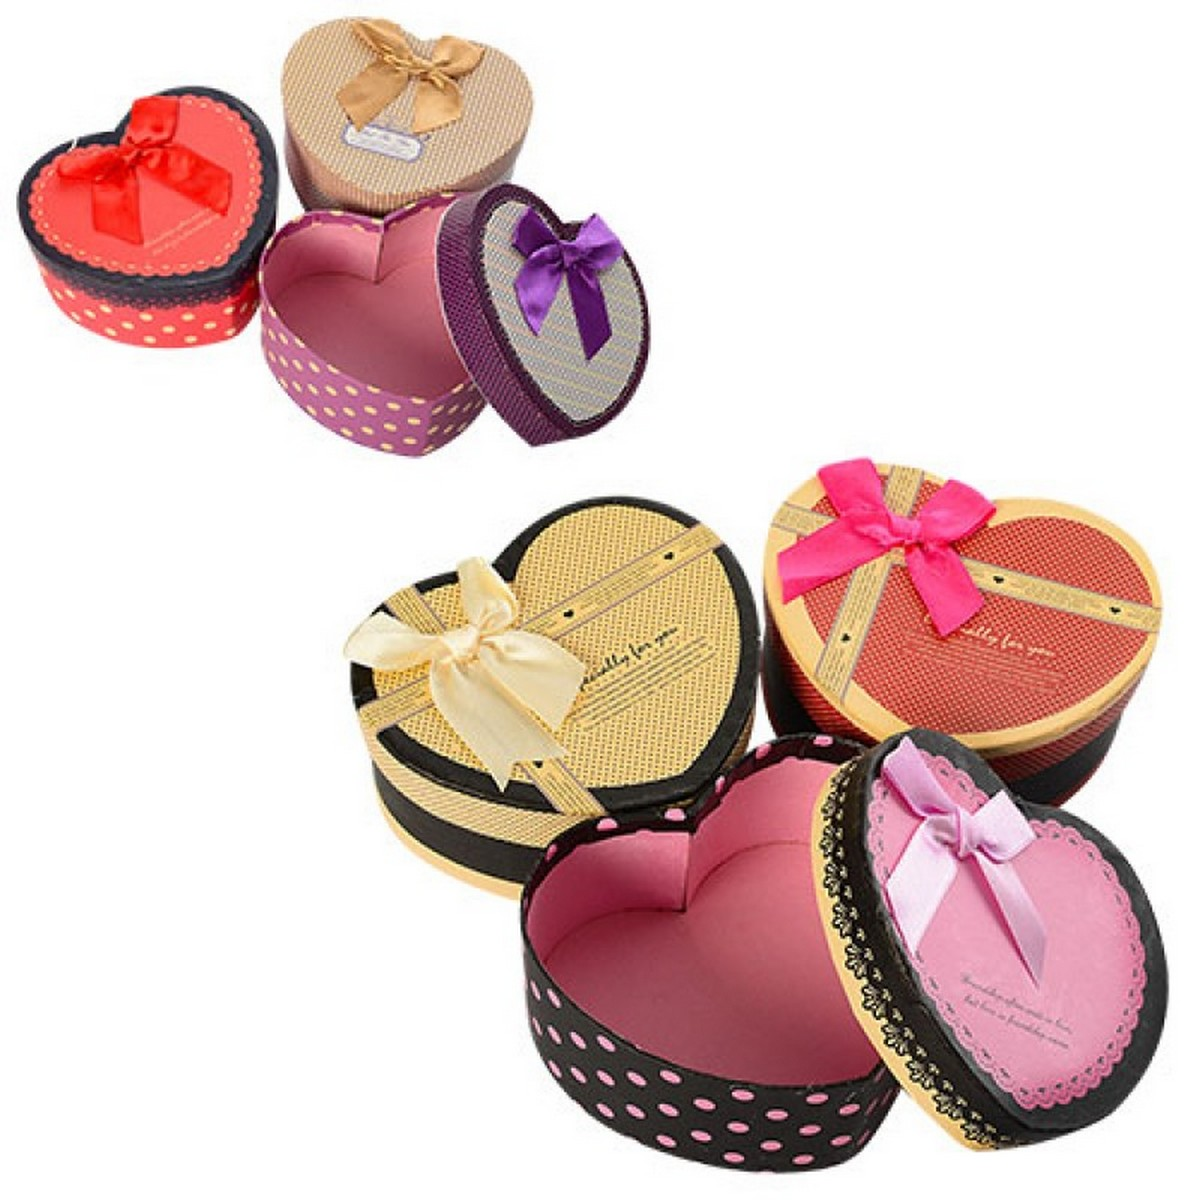 bk toys ltd. Шкатулка сувенирная «Сердце» 6 видов 6200